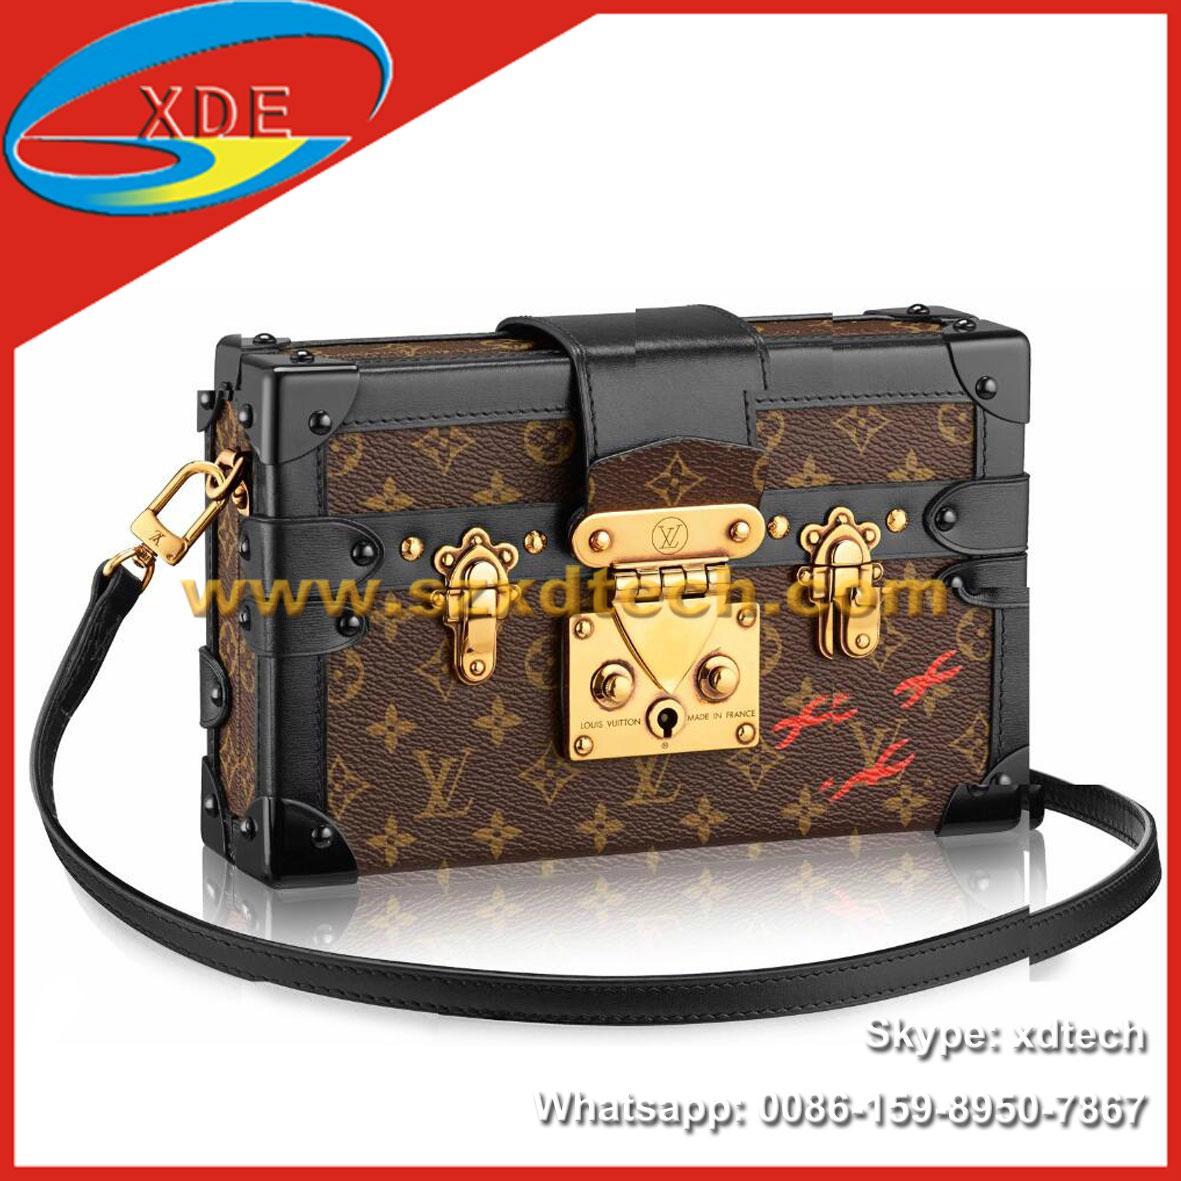 Top Quality LV Handbags Louis Vuitton Bags Purse 1:1 Copy Evening Bags LV Bags